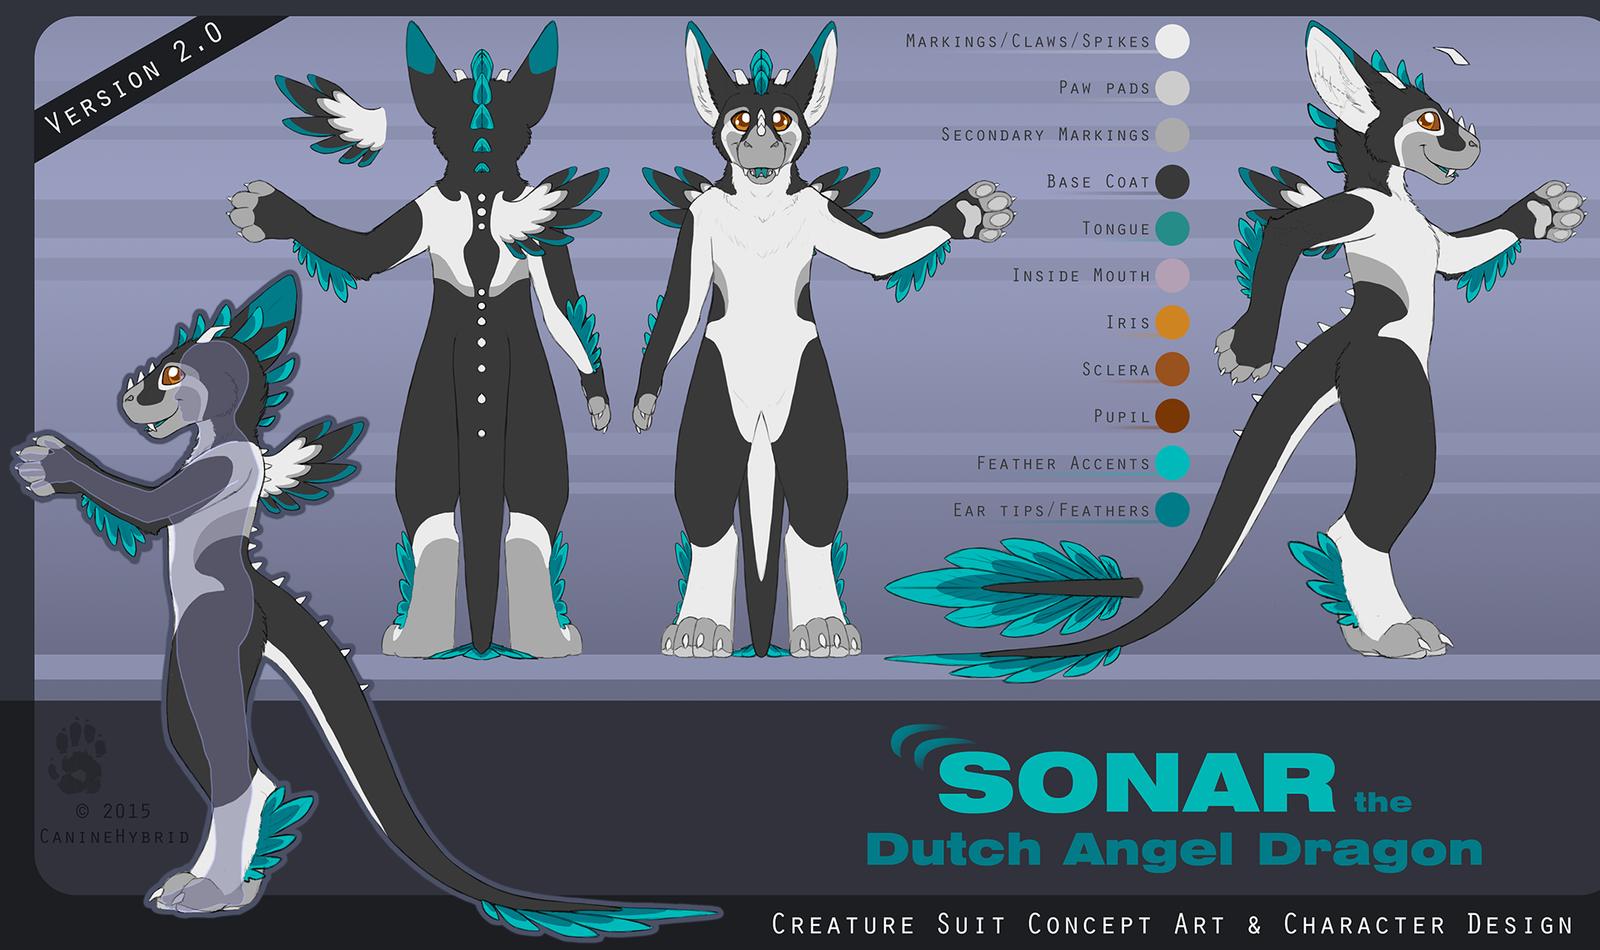 Online Color Palette Maker Sonar The Dutch Angel Dragon 2 0 By Caninehybrid On Deviantart